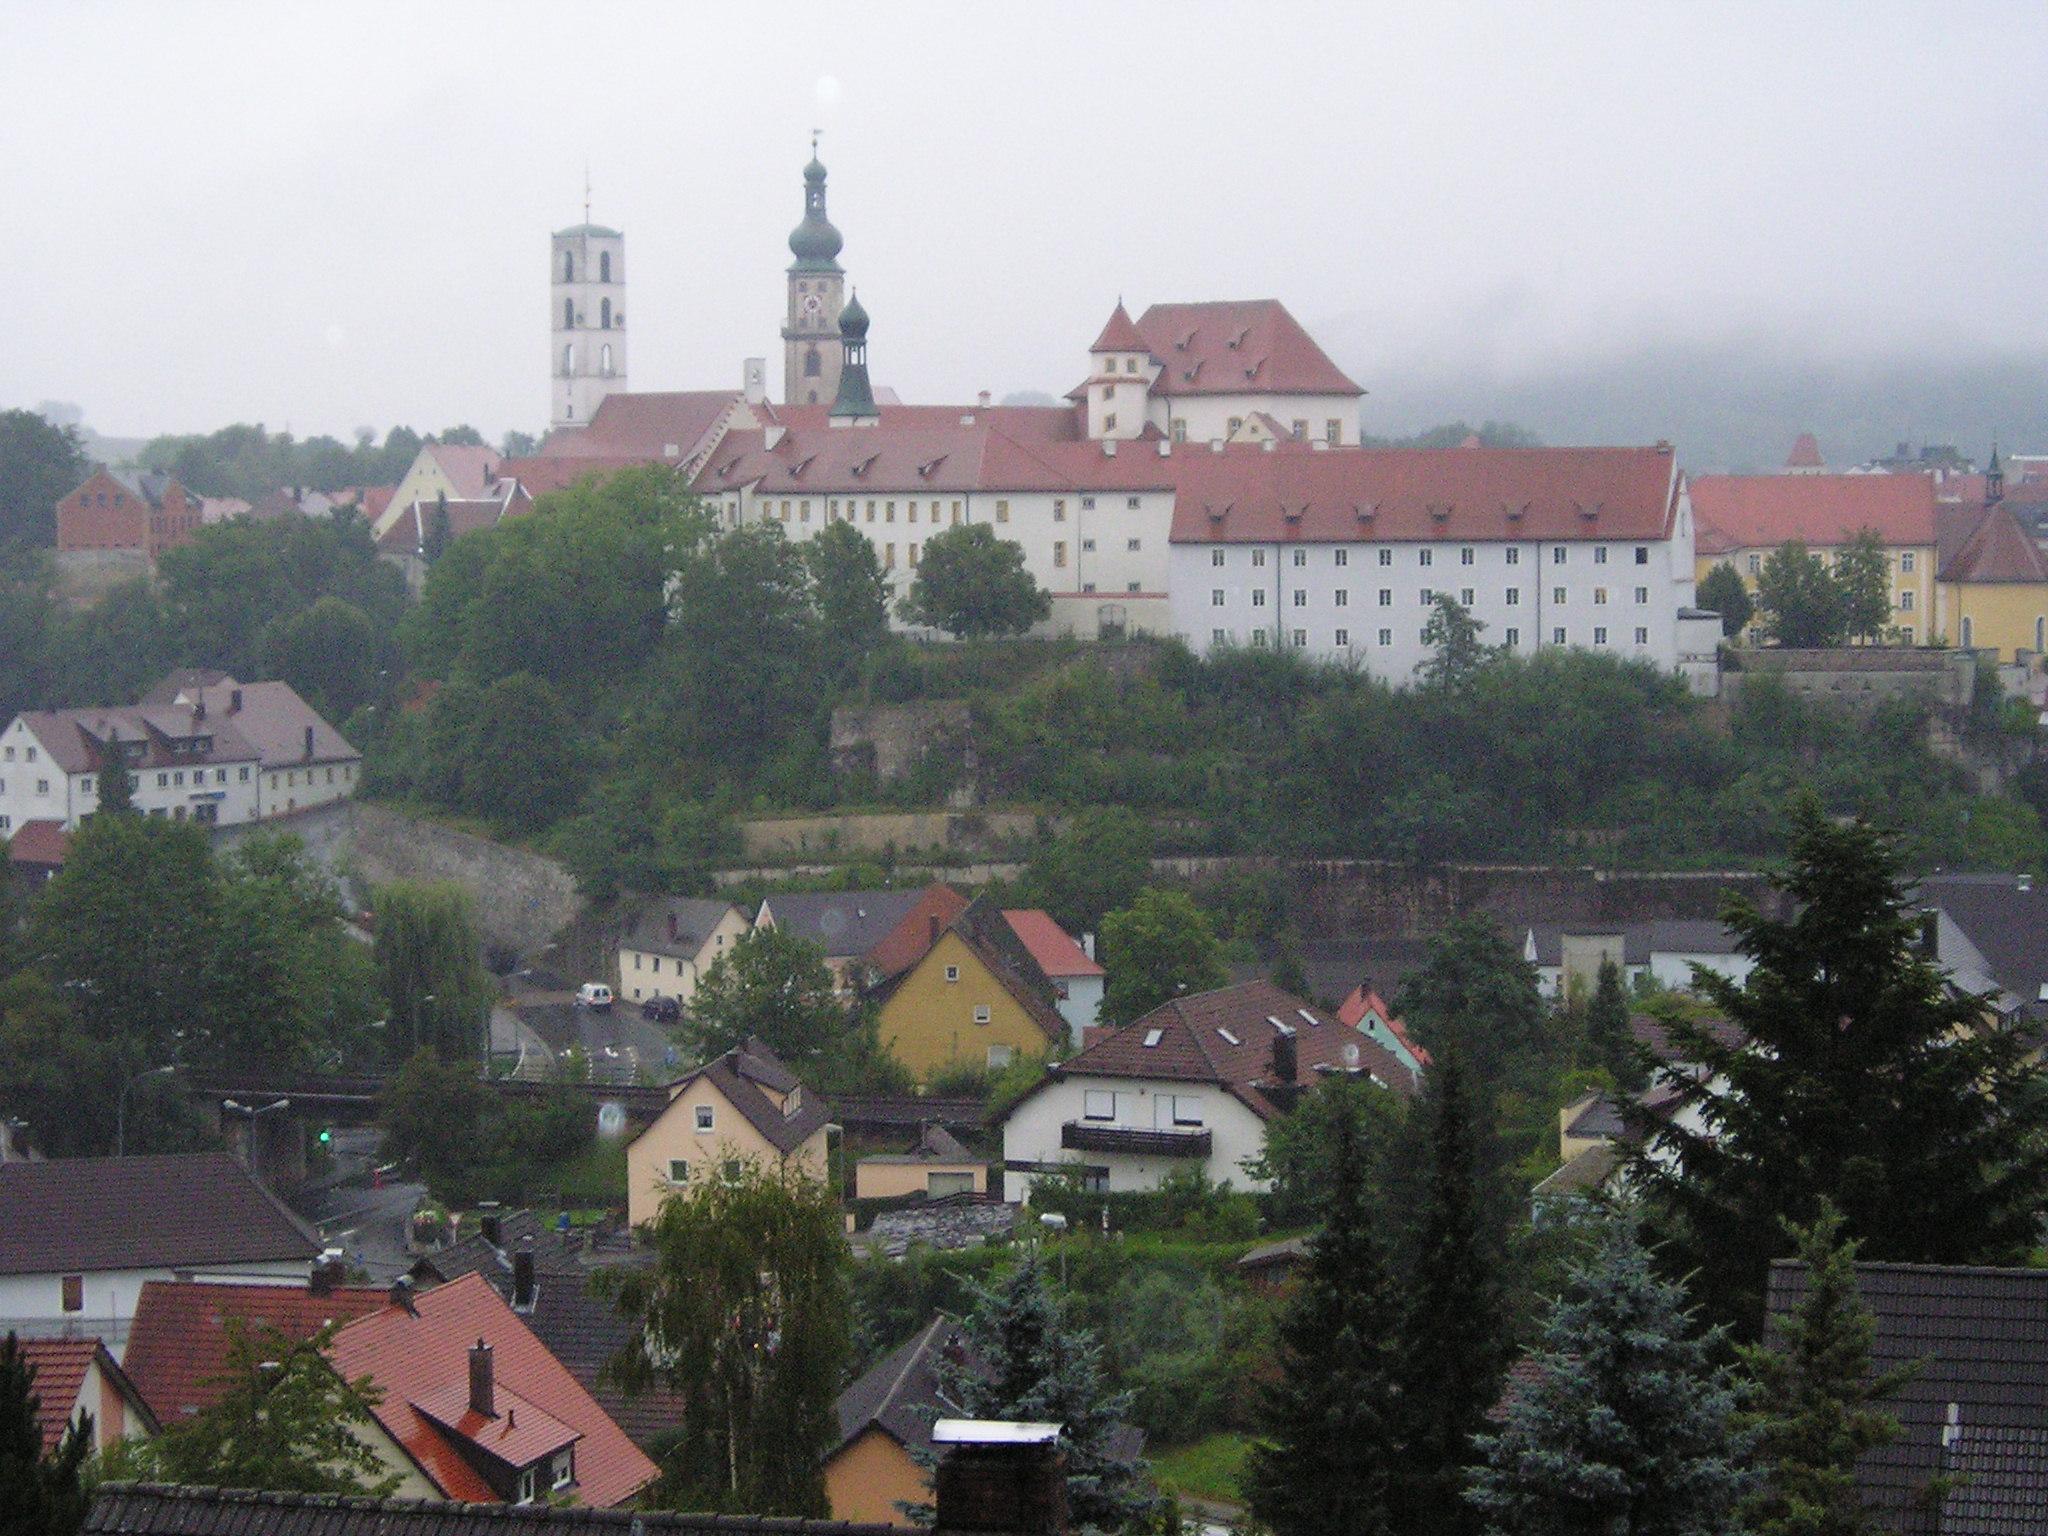 St Anna Krankenhaus Sulzbach Rosenberg